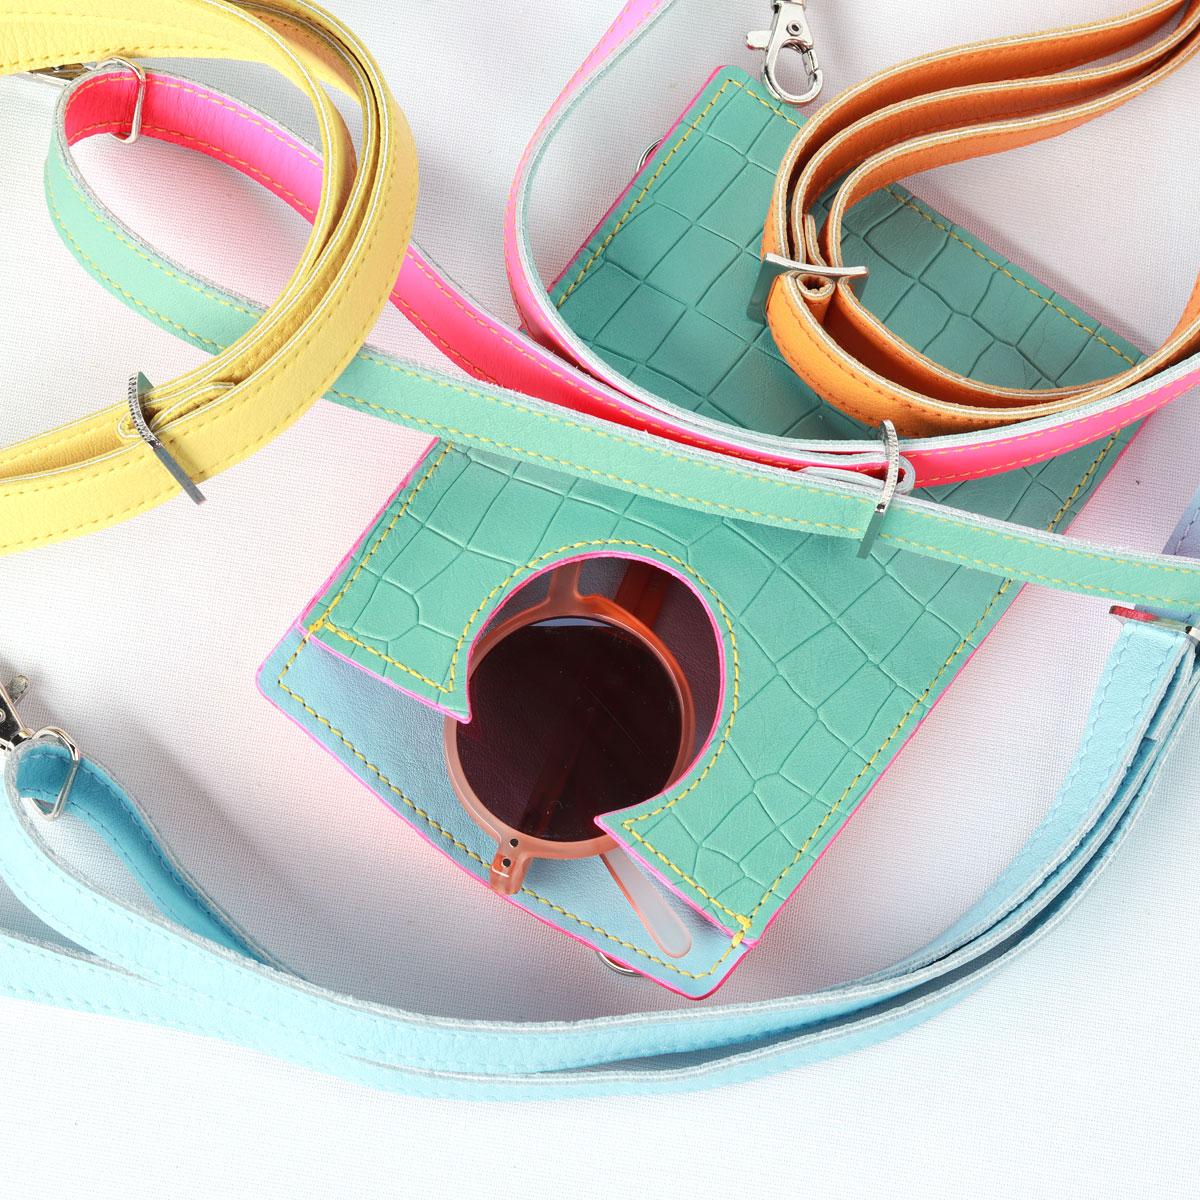 elfenklang brusttaschen crossbody taschen handy brillenetui